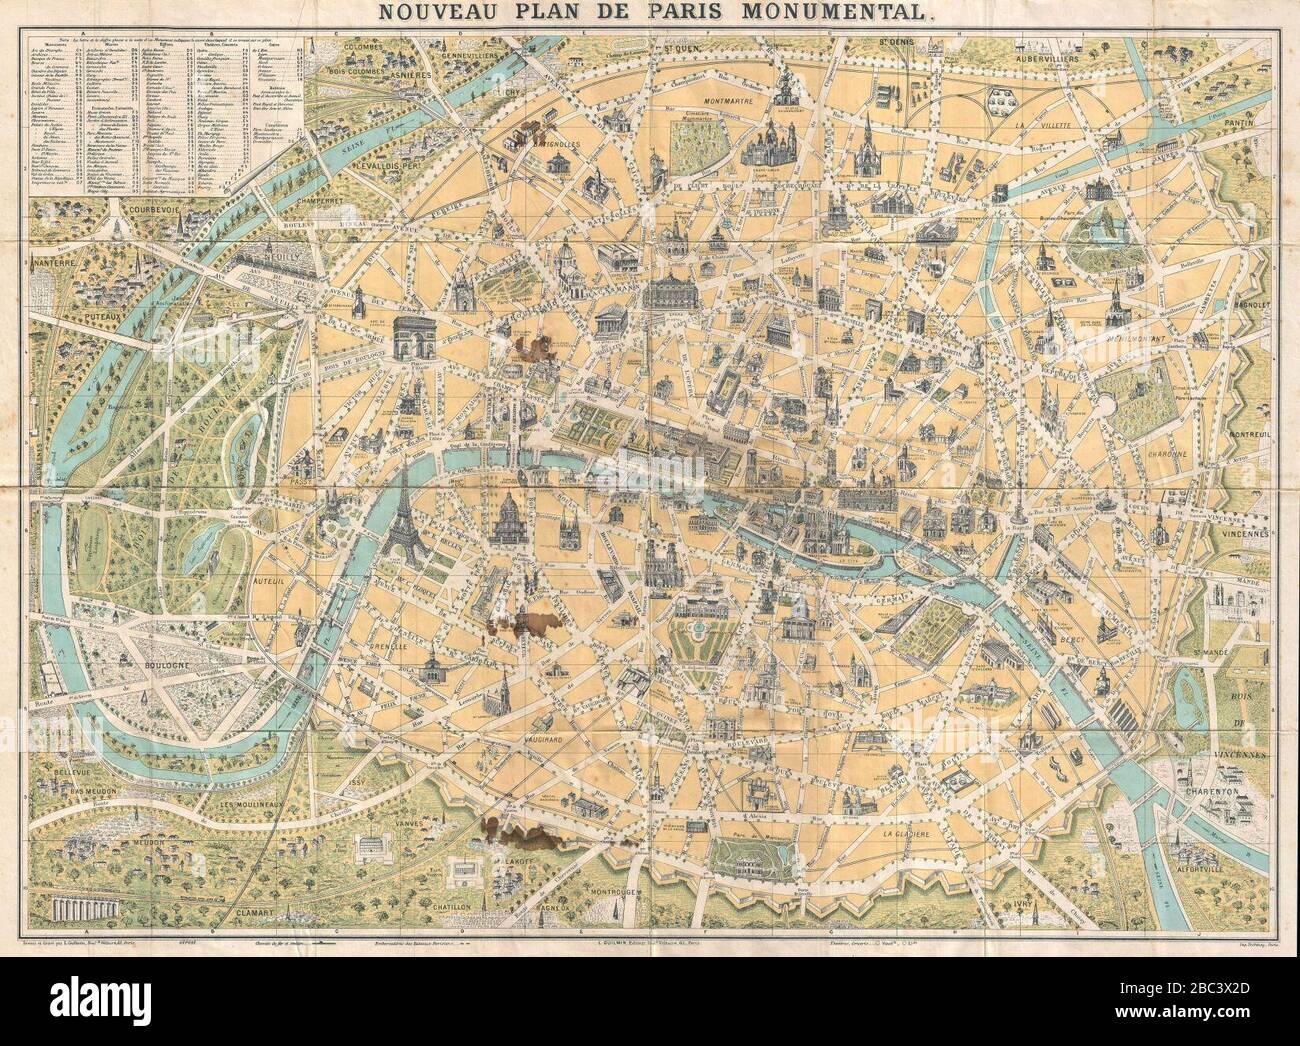 Parigi Cartina Monumenti.Guilmin Mappa Di Parigi Francia Monumenti Geographicus Paris Guilmin Foto Stock Alamy